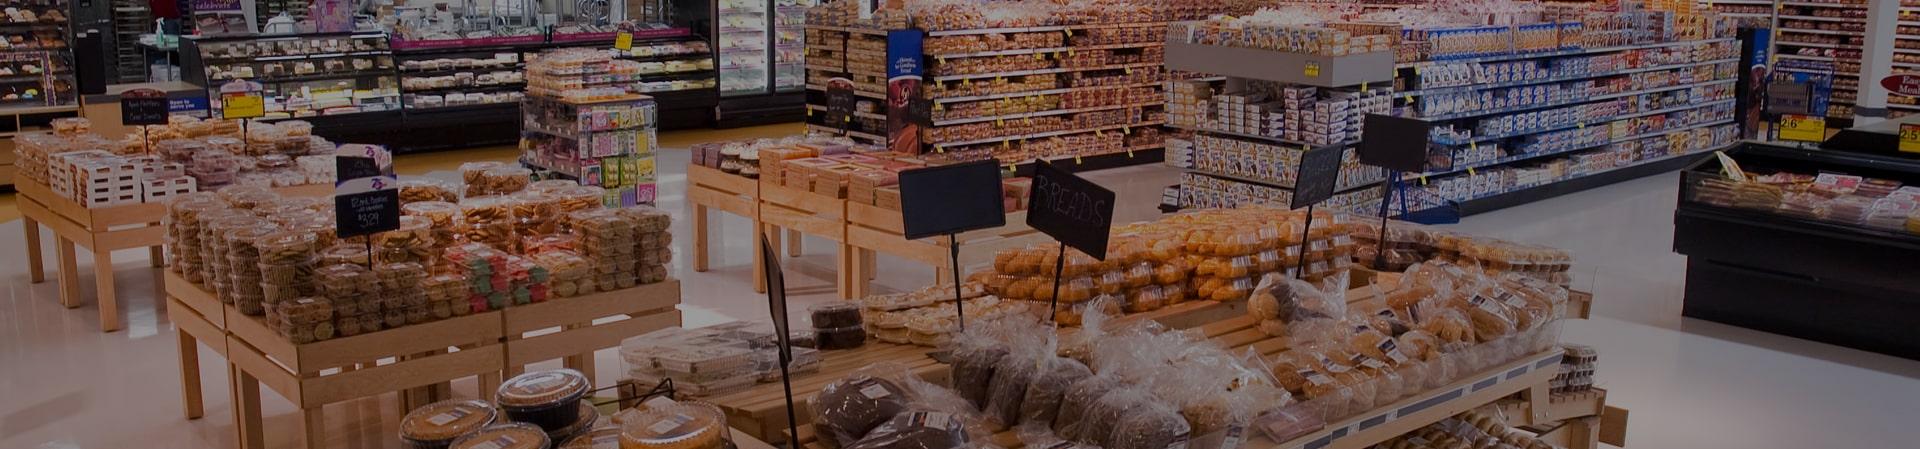 Keller Pest Control Retail